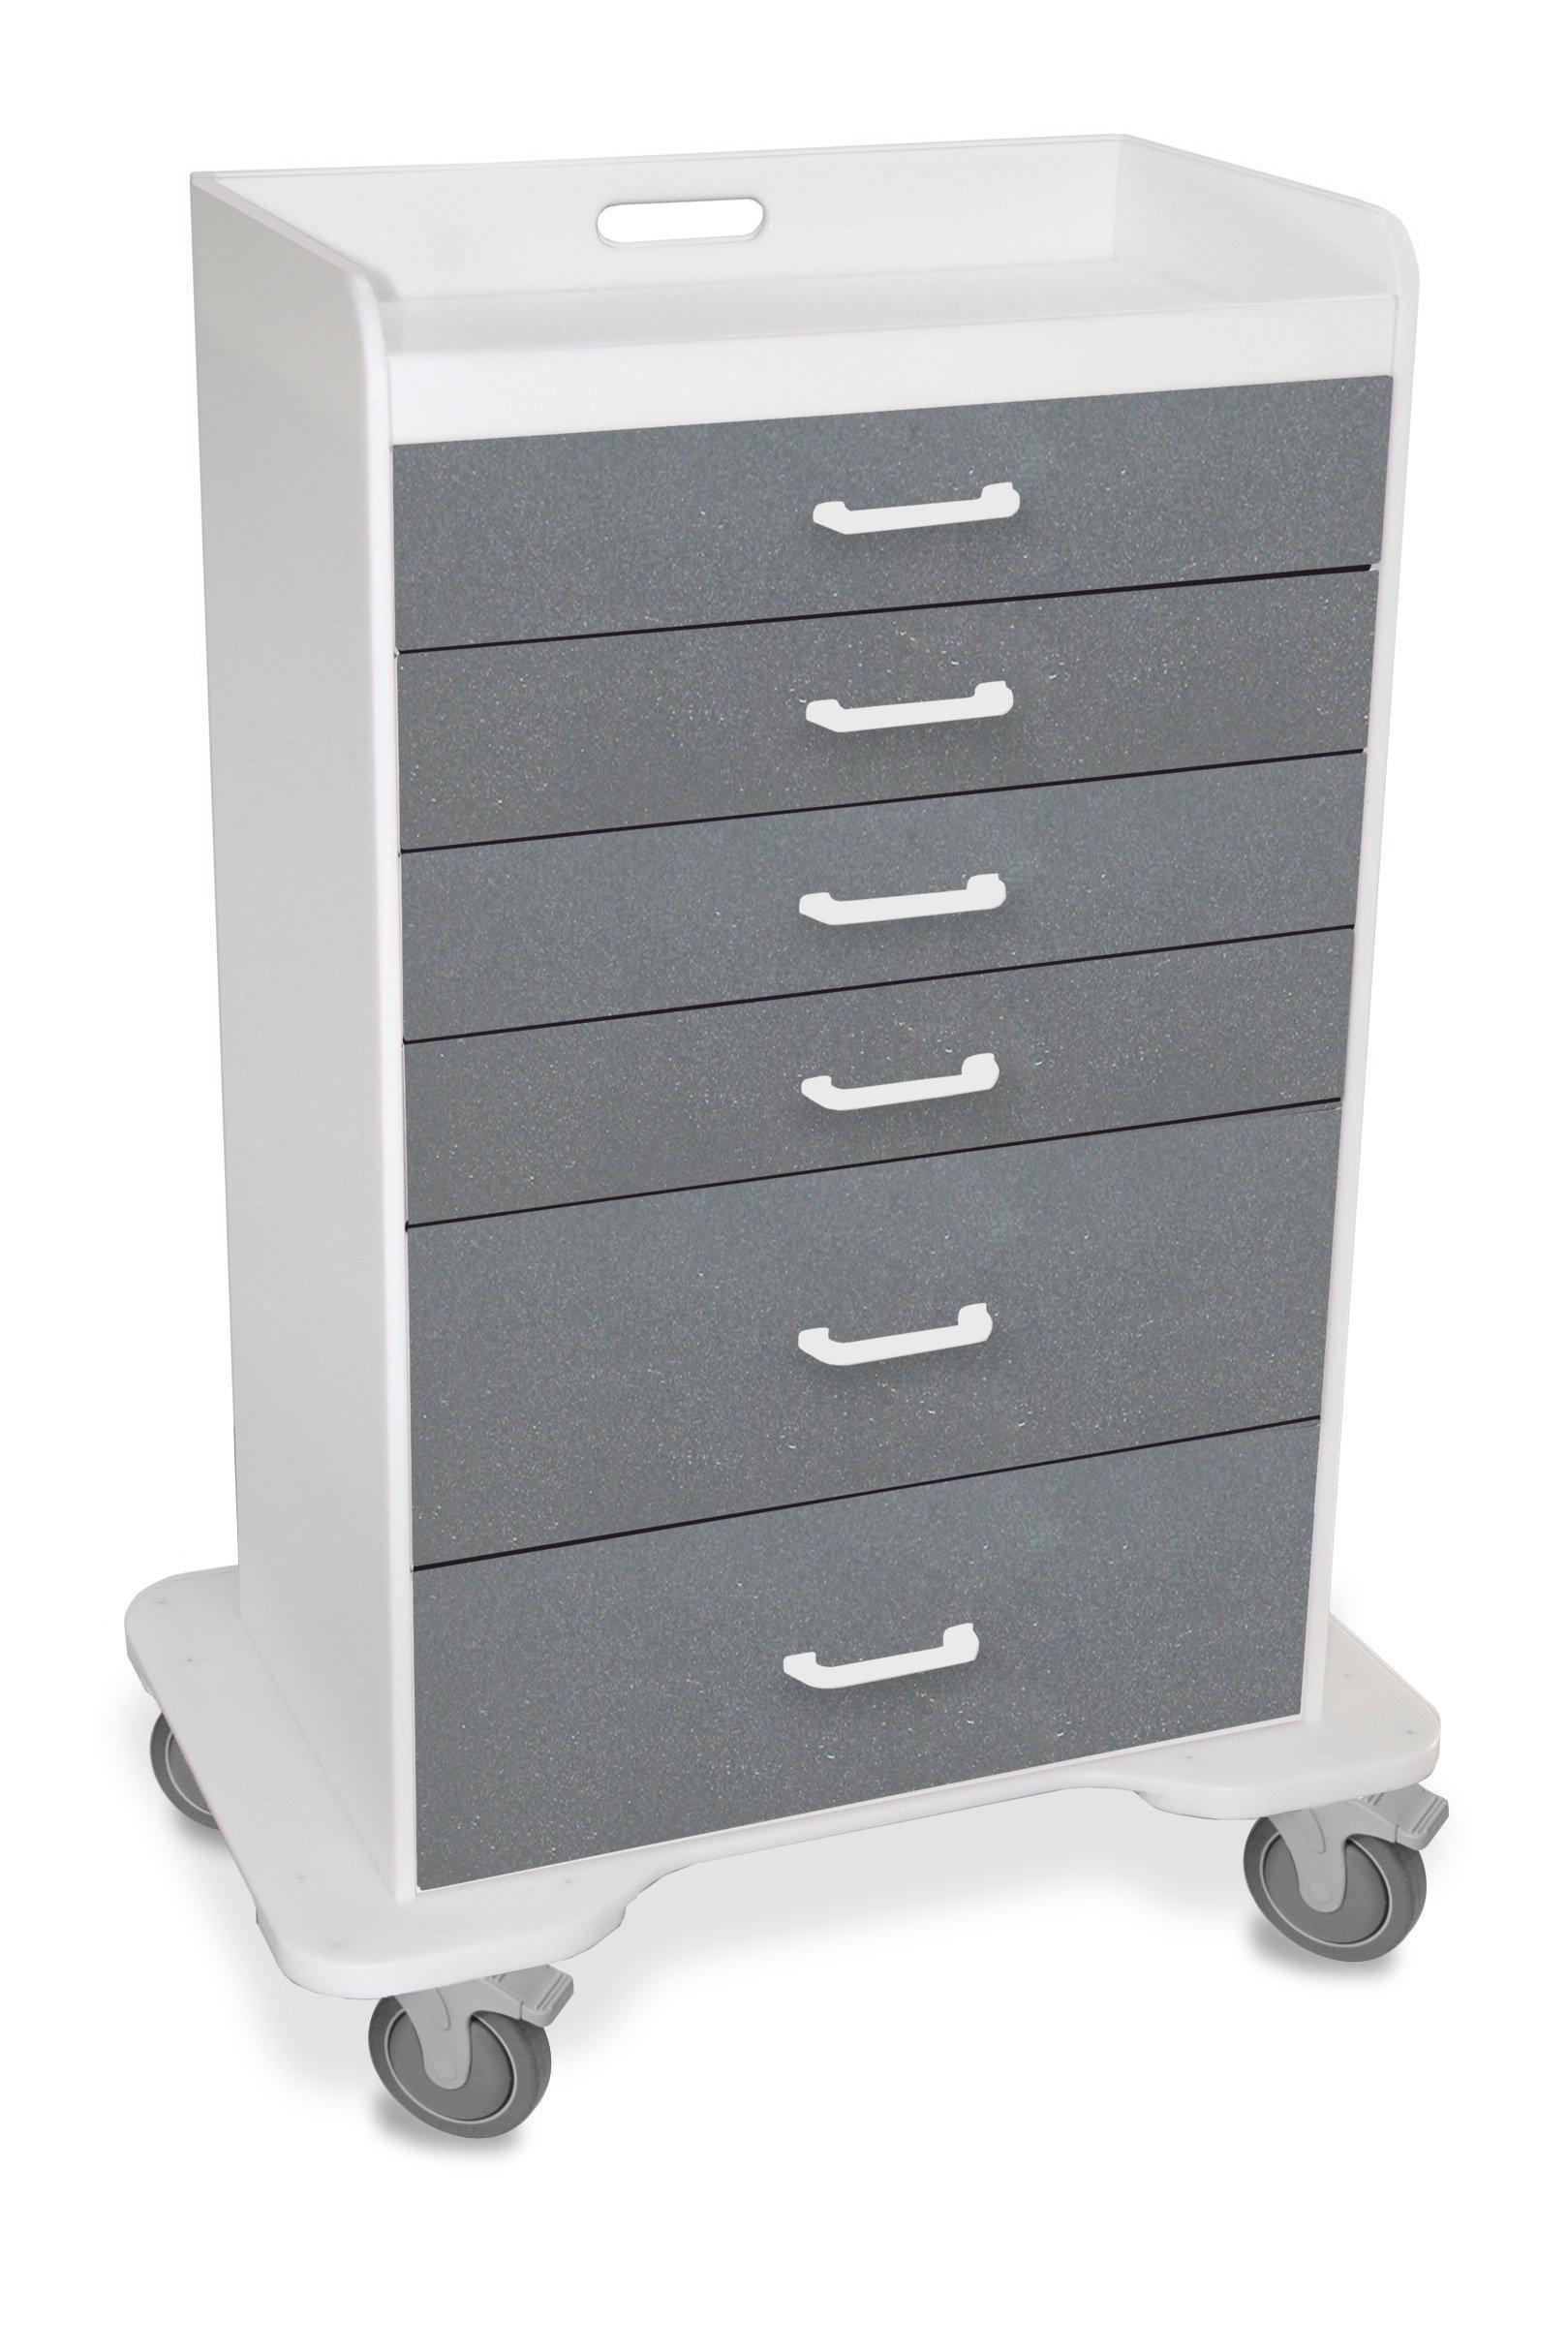 "TrippNT 51079 Polyethylene Procedure Cart, Locking, 31"" Width x 48"" Height x 20"" Depth, 6 Drawers, Silver Metallic"